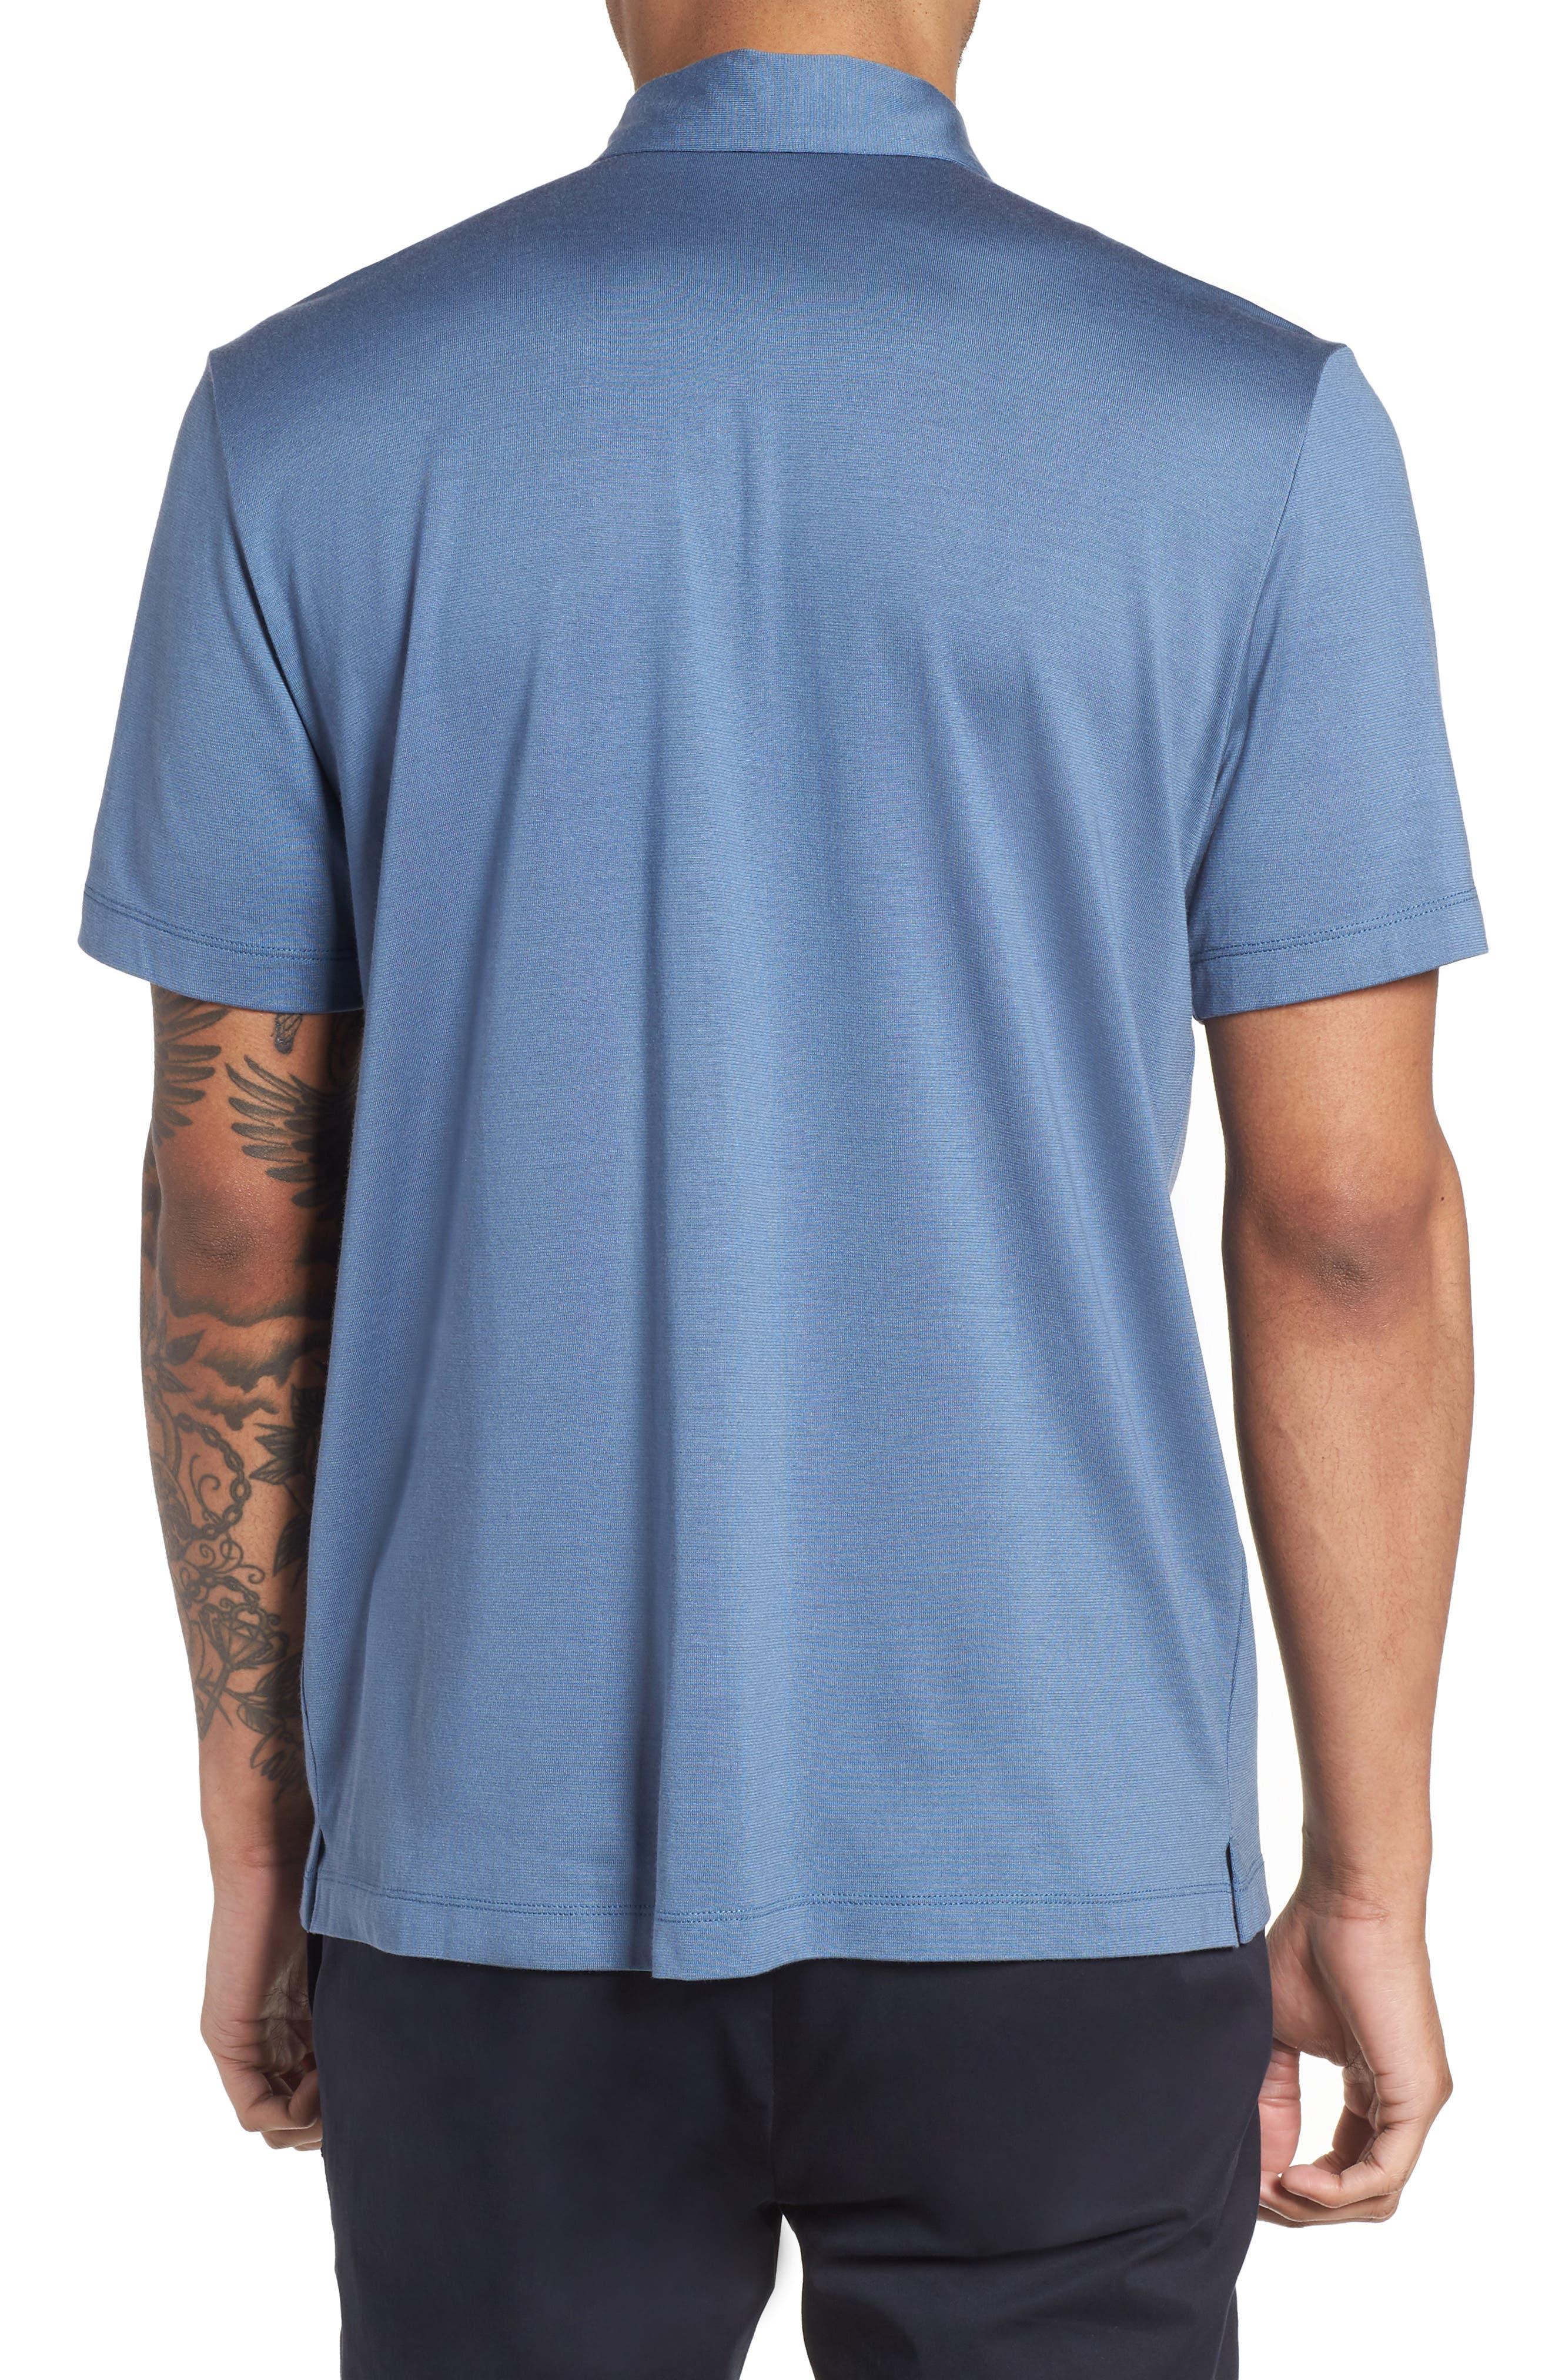 Incisive Silk & Cotton Short Sleeve Sport Shirt,                             Alternate thumbnail 2, color,                             Iris